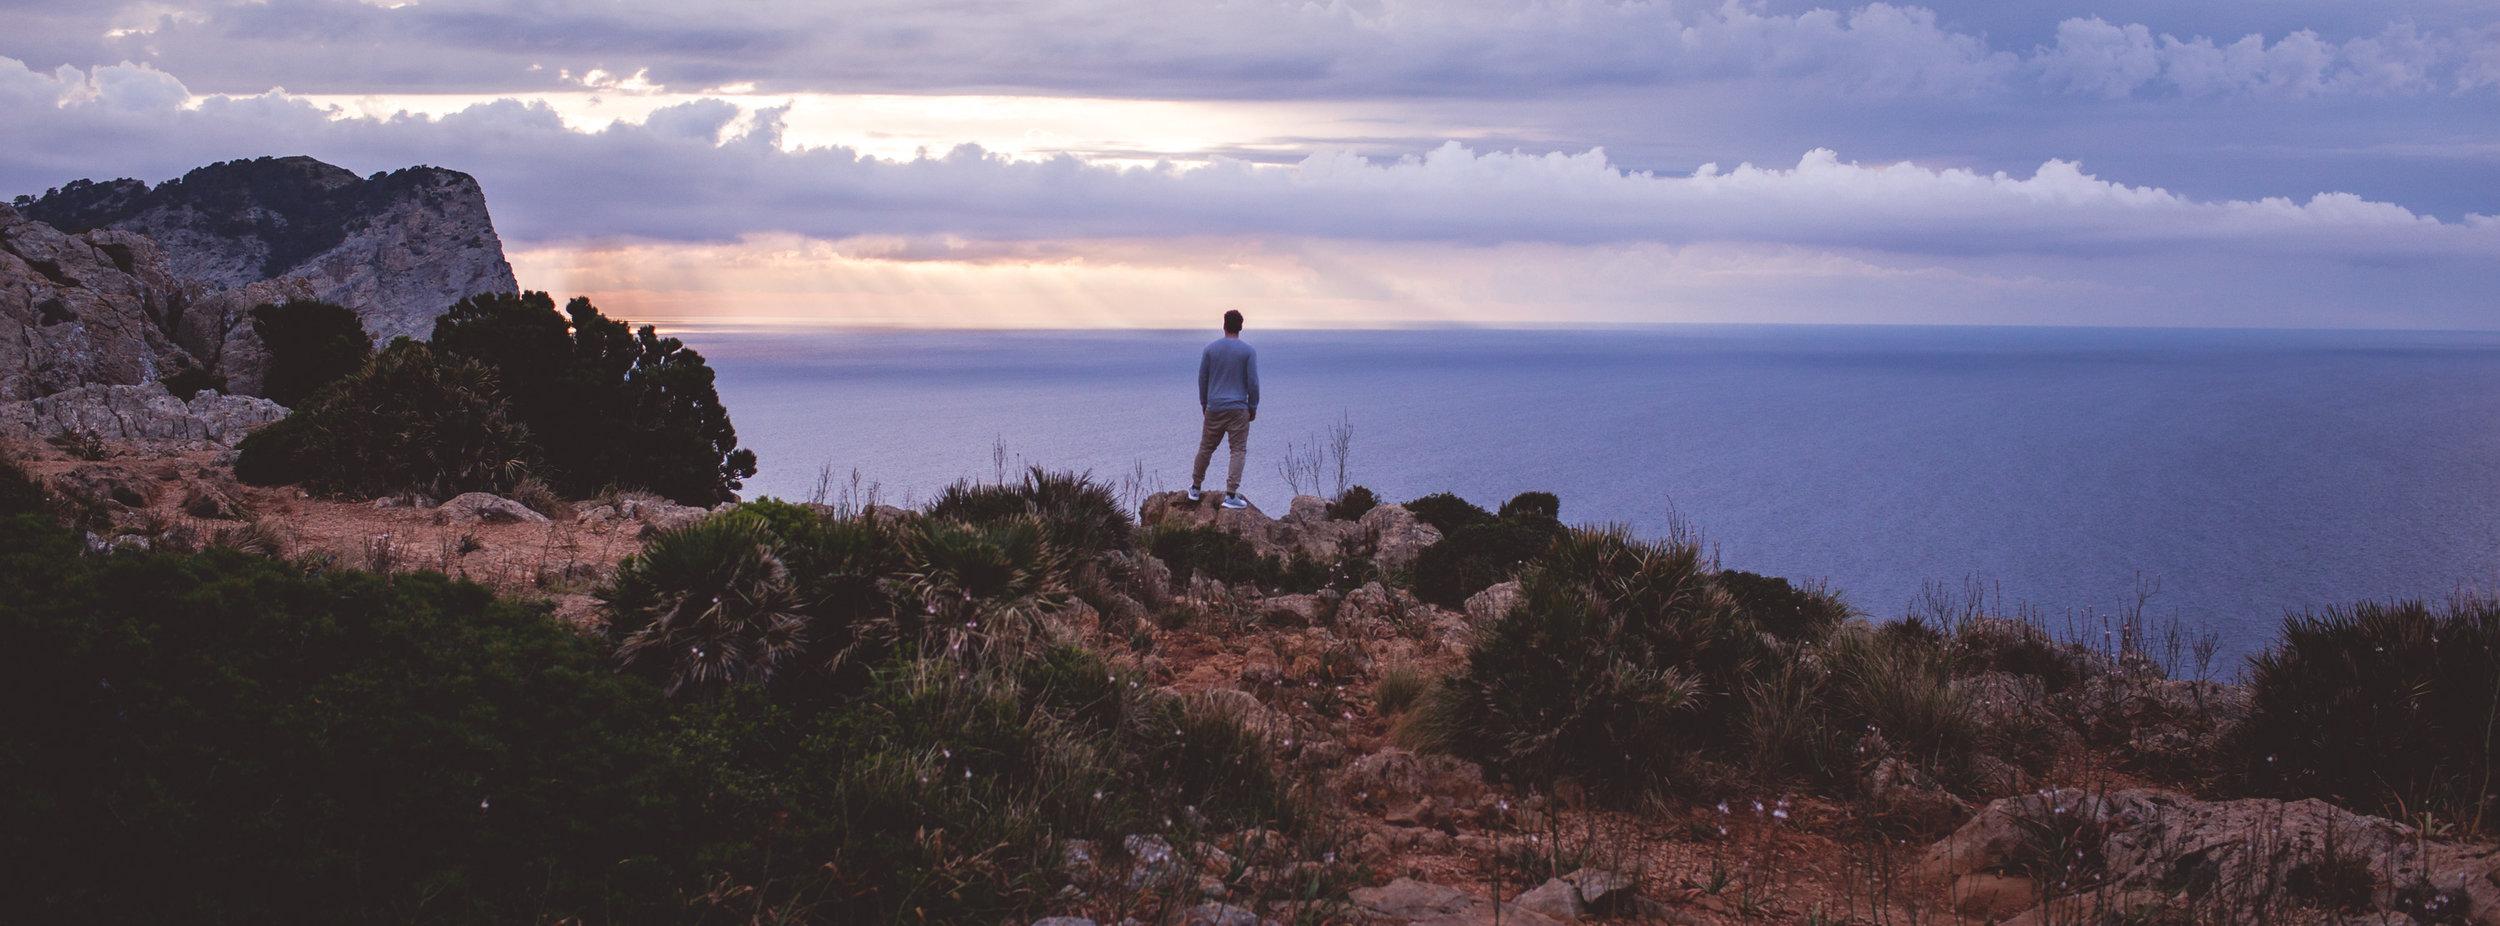 Mallorca Titel-1.jpg